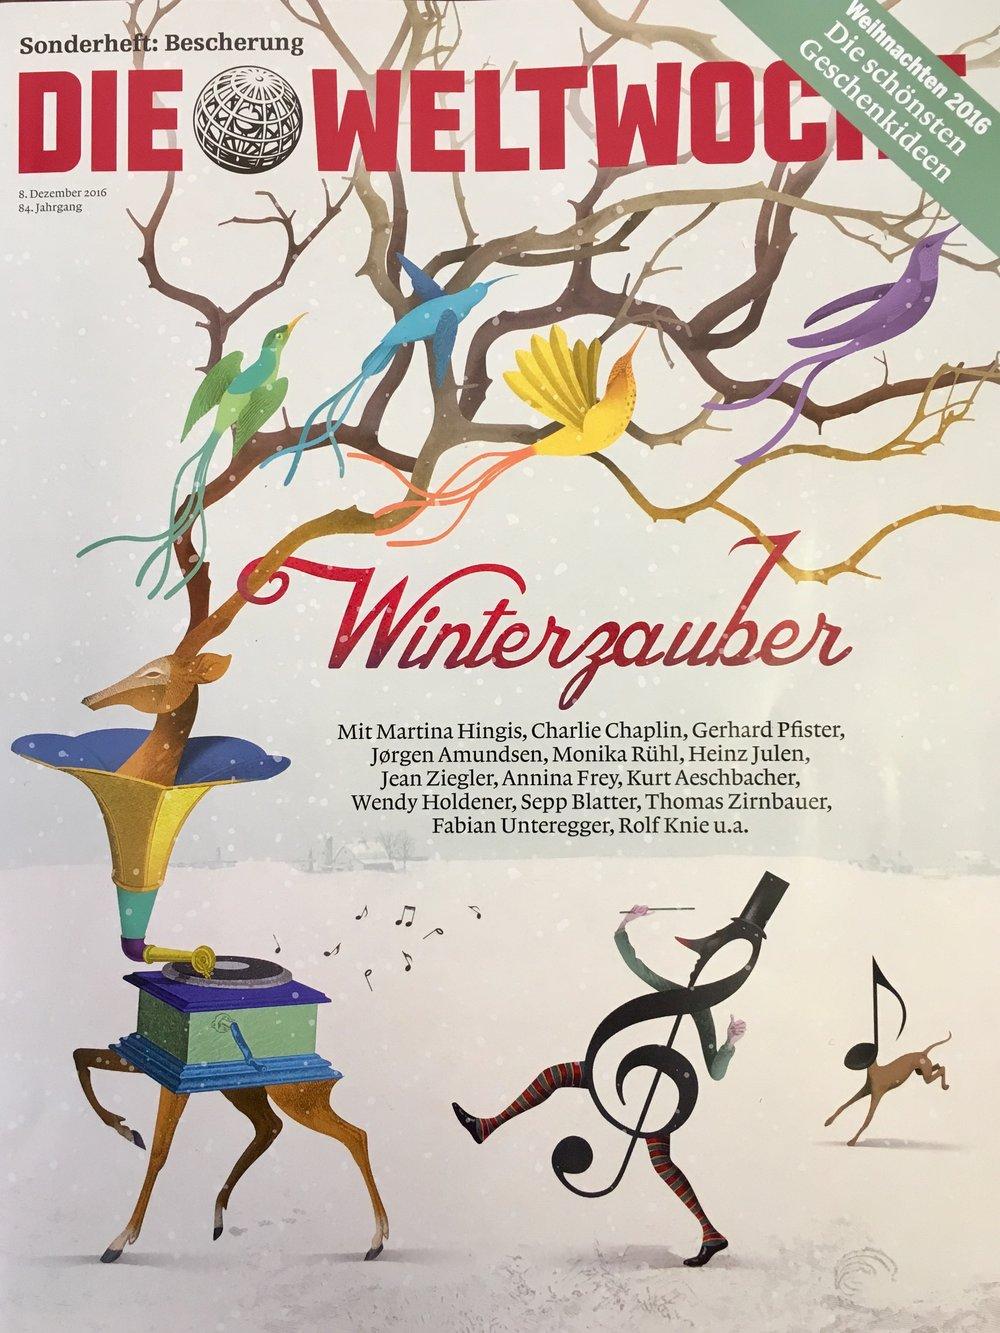 Cover Weltwoche.jpg